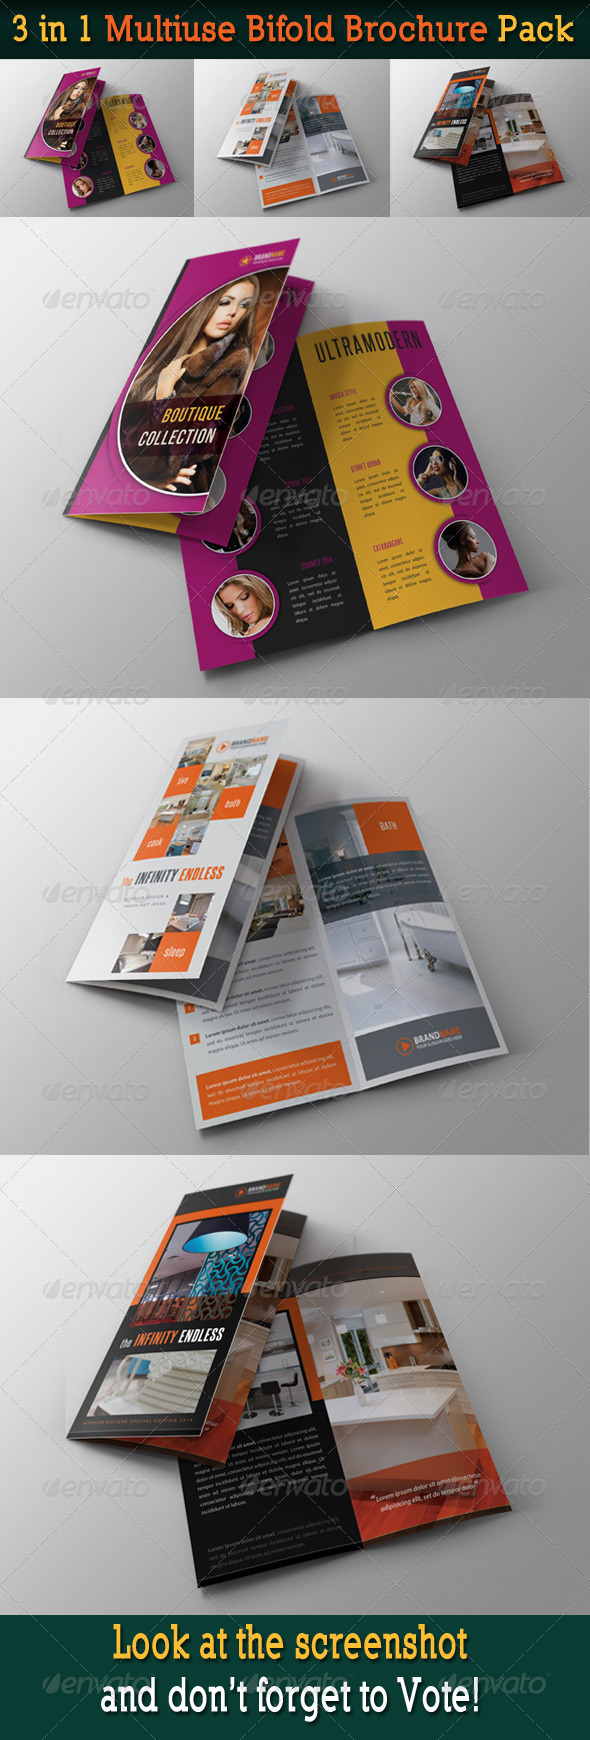 3 in 1 Multiuse Bifold Brochure Pack - Corporate Brochures